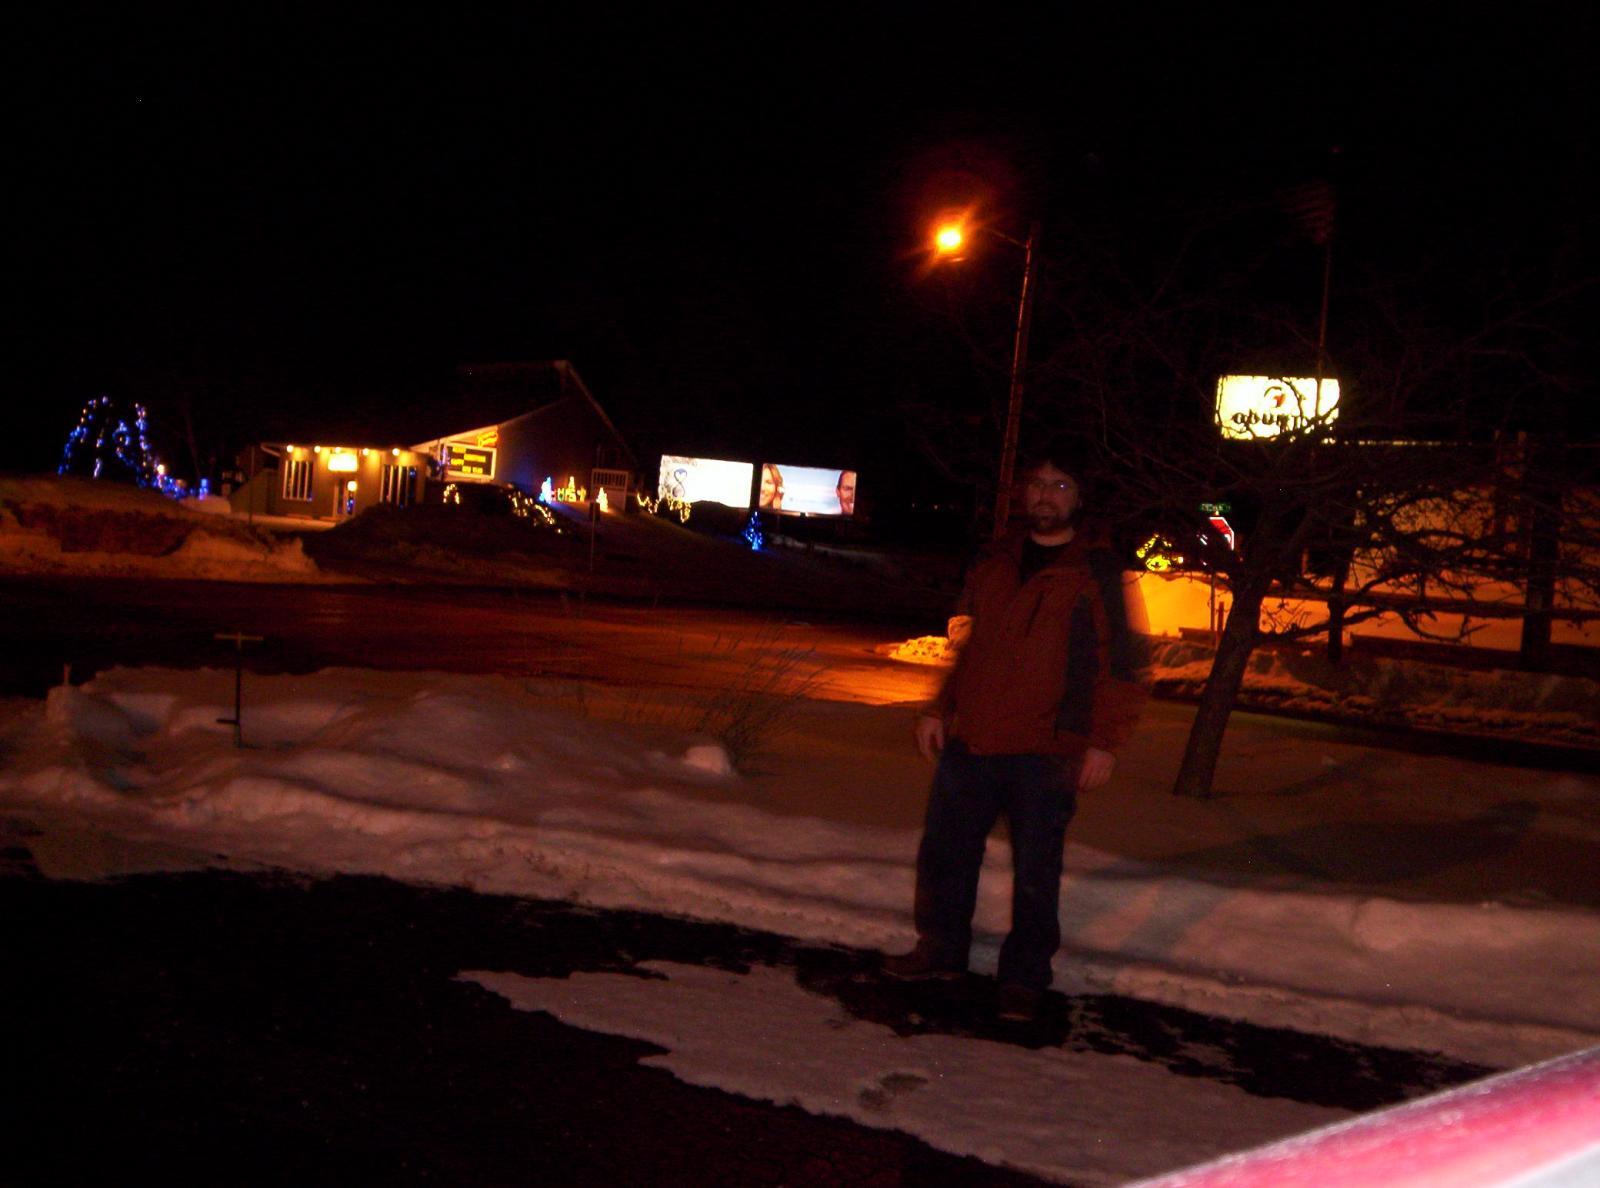 Immortality Institute billboard night shot